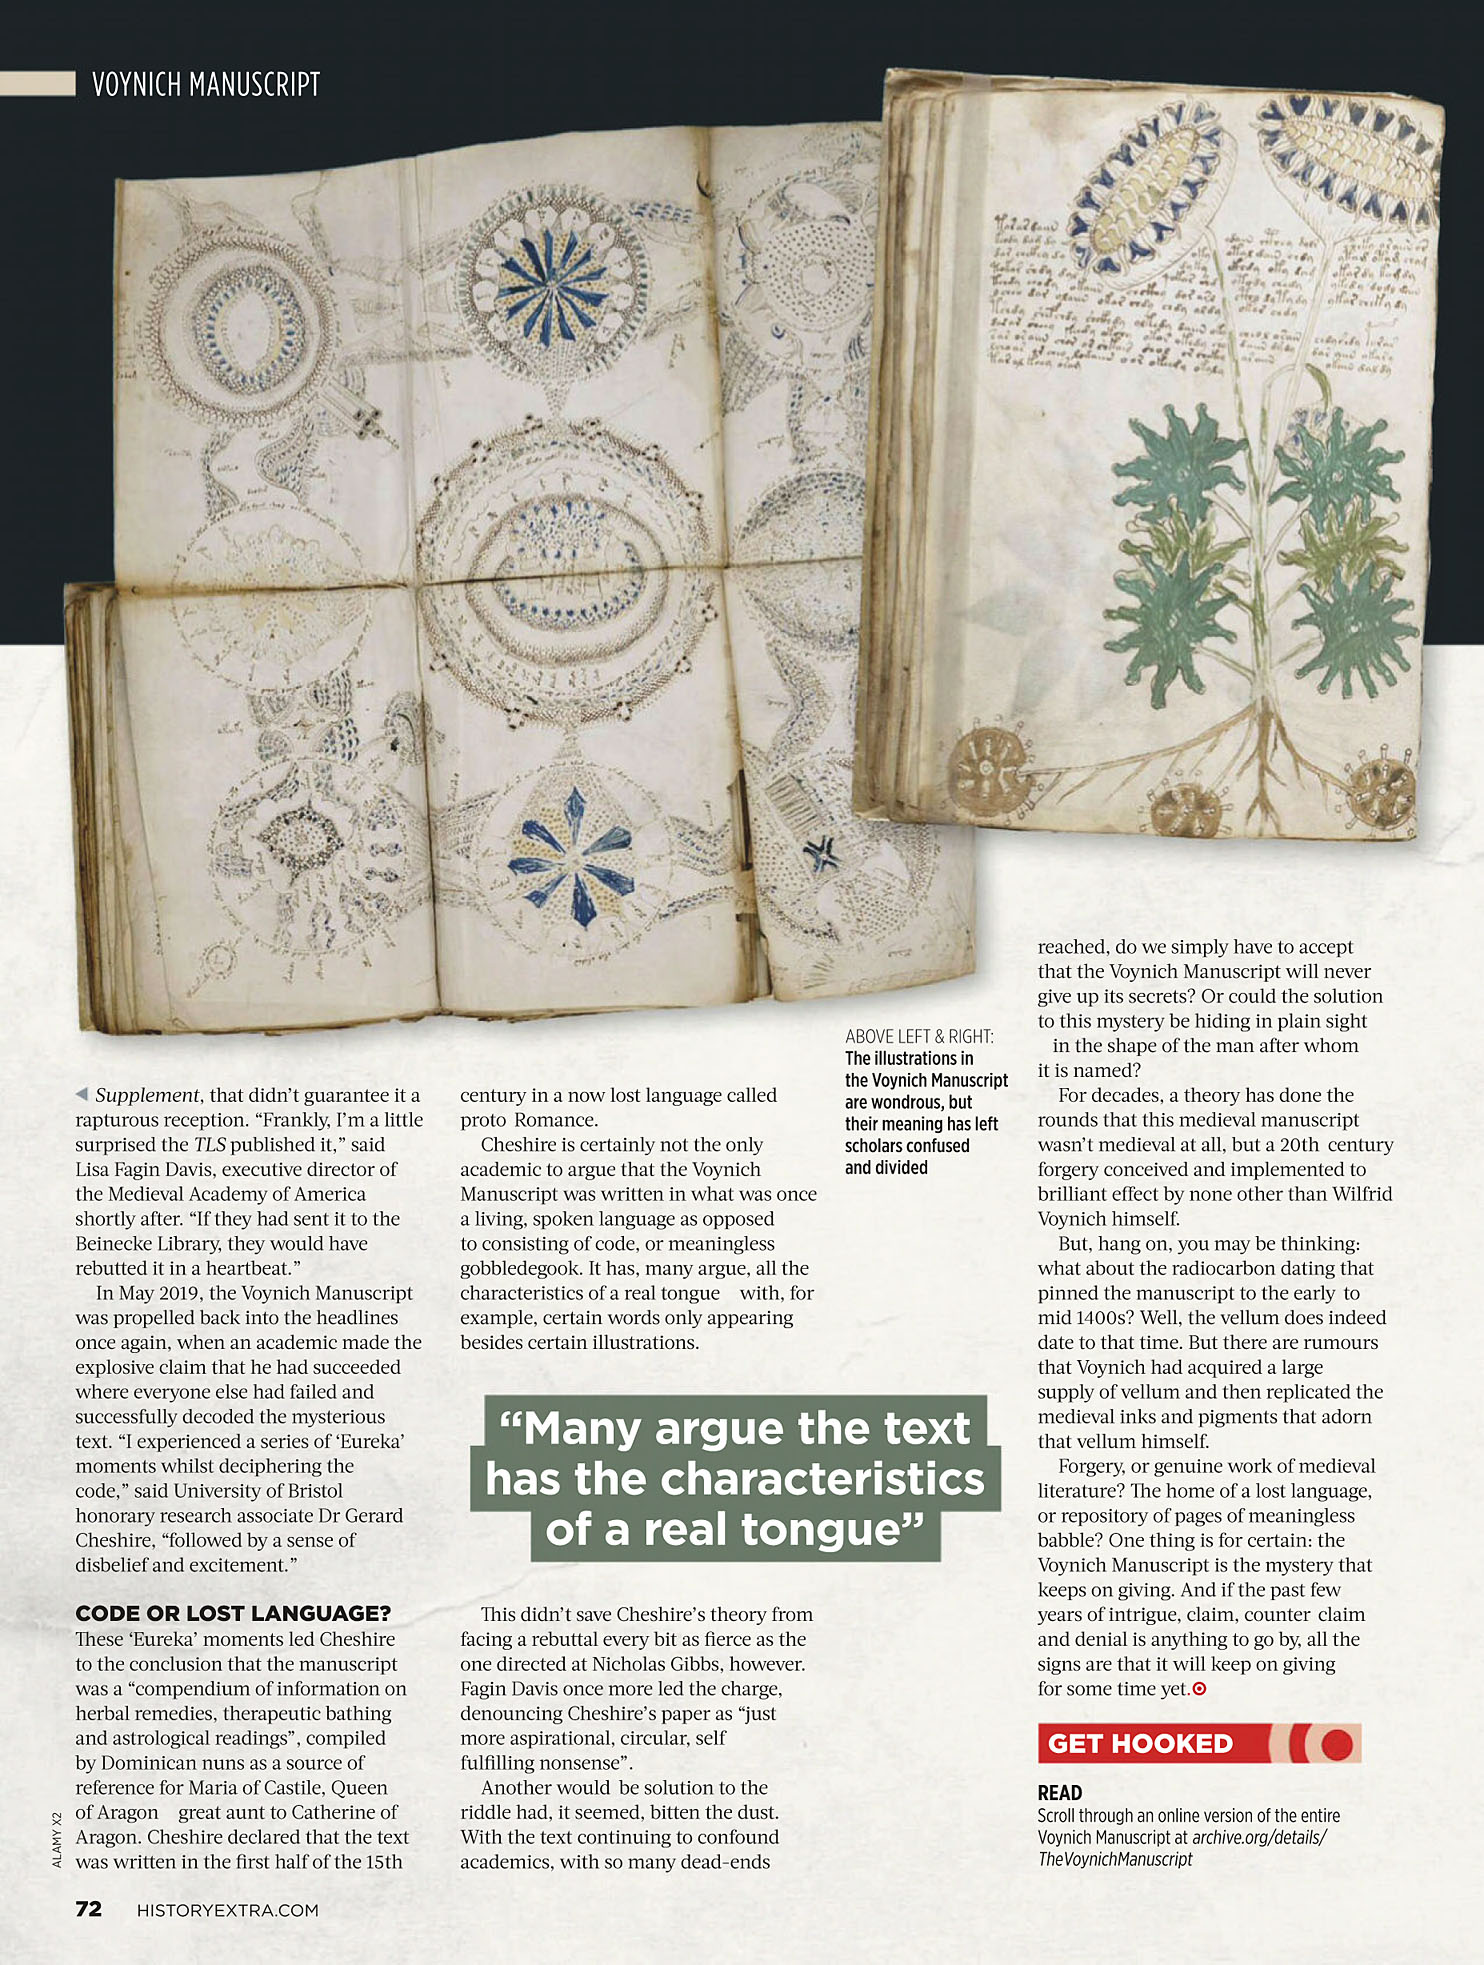 History Revealed 2020-05 Voynich Manuscript-6.jpg